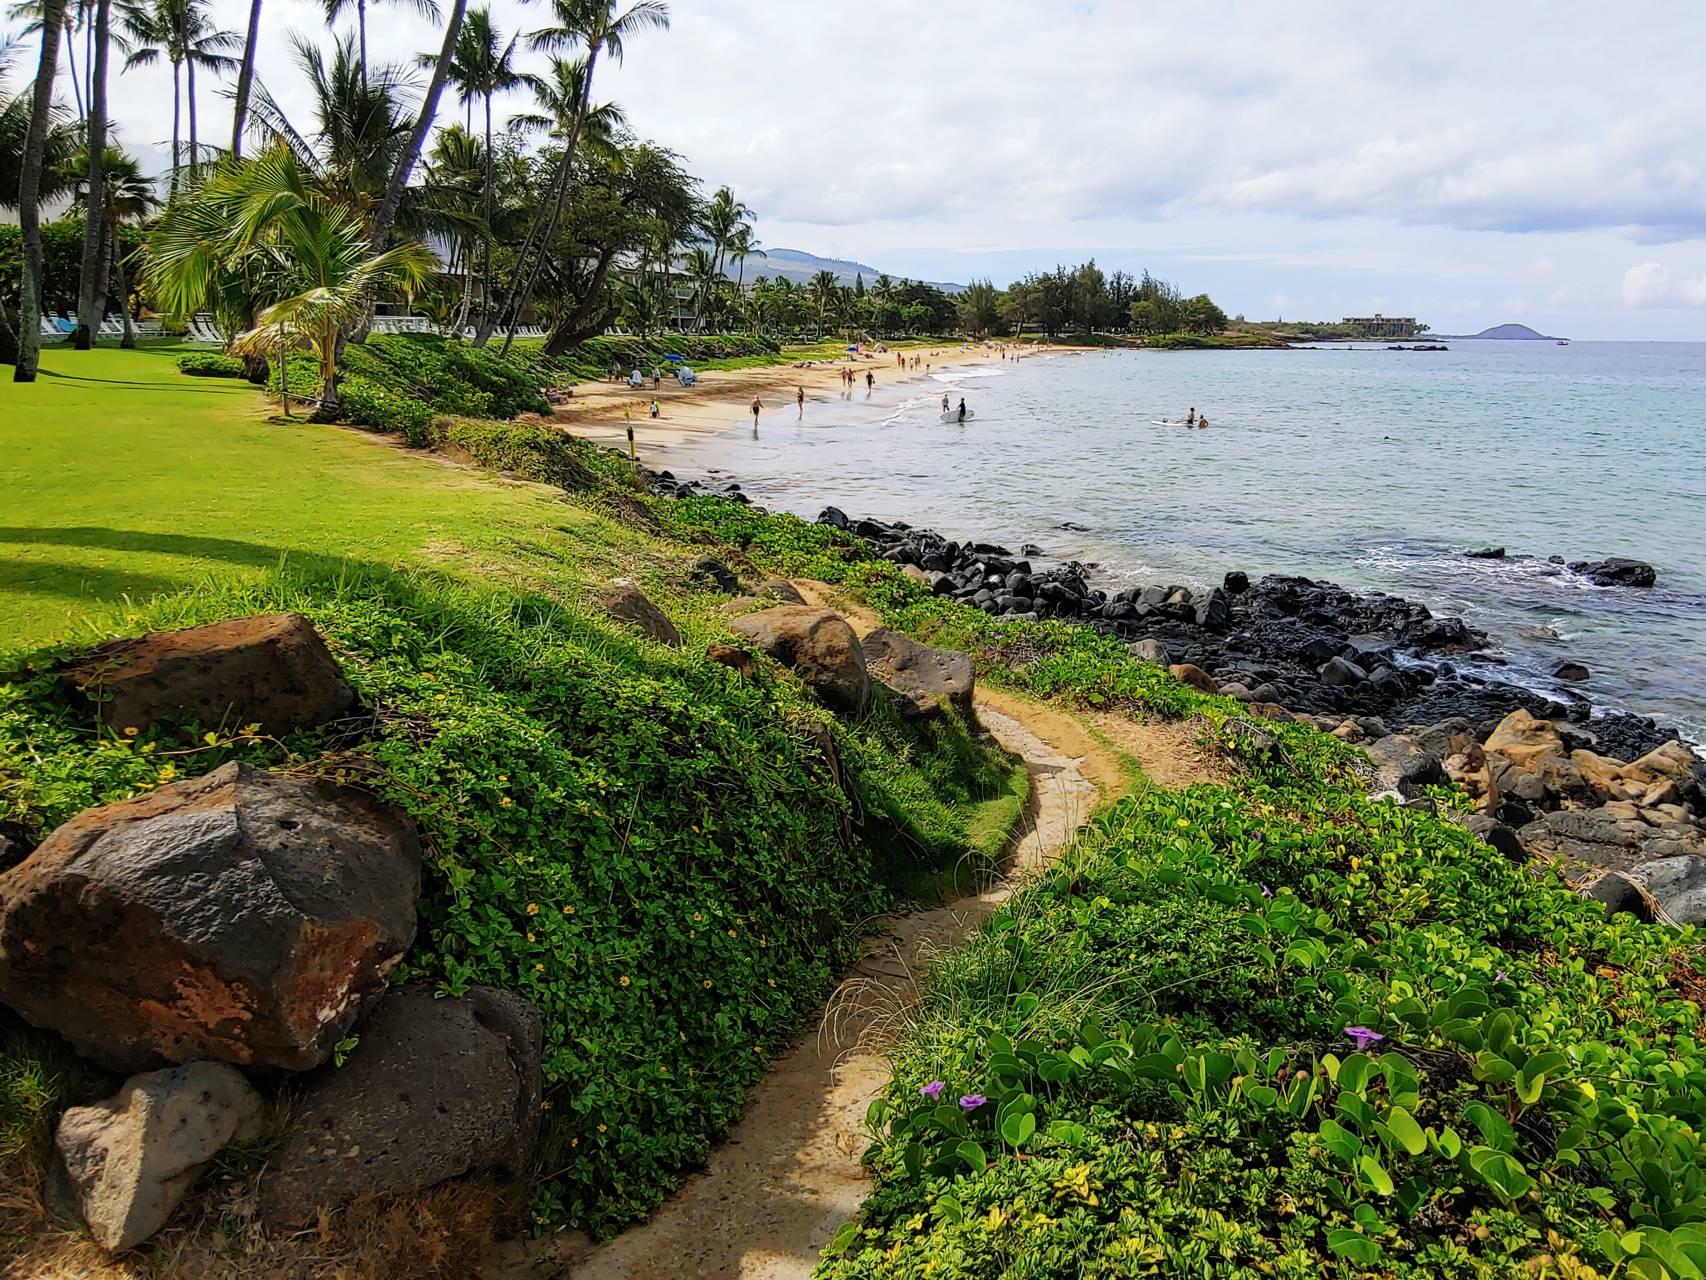 Maui path to beach